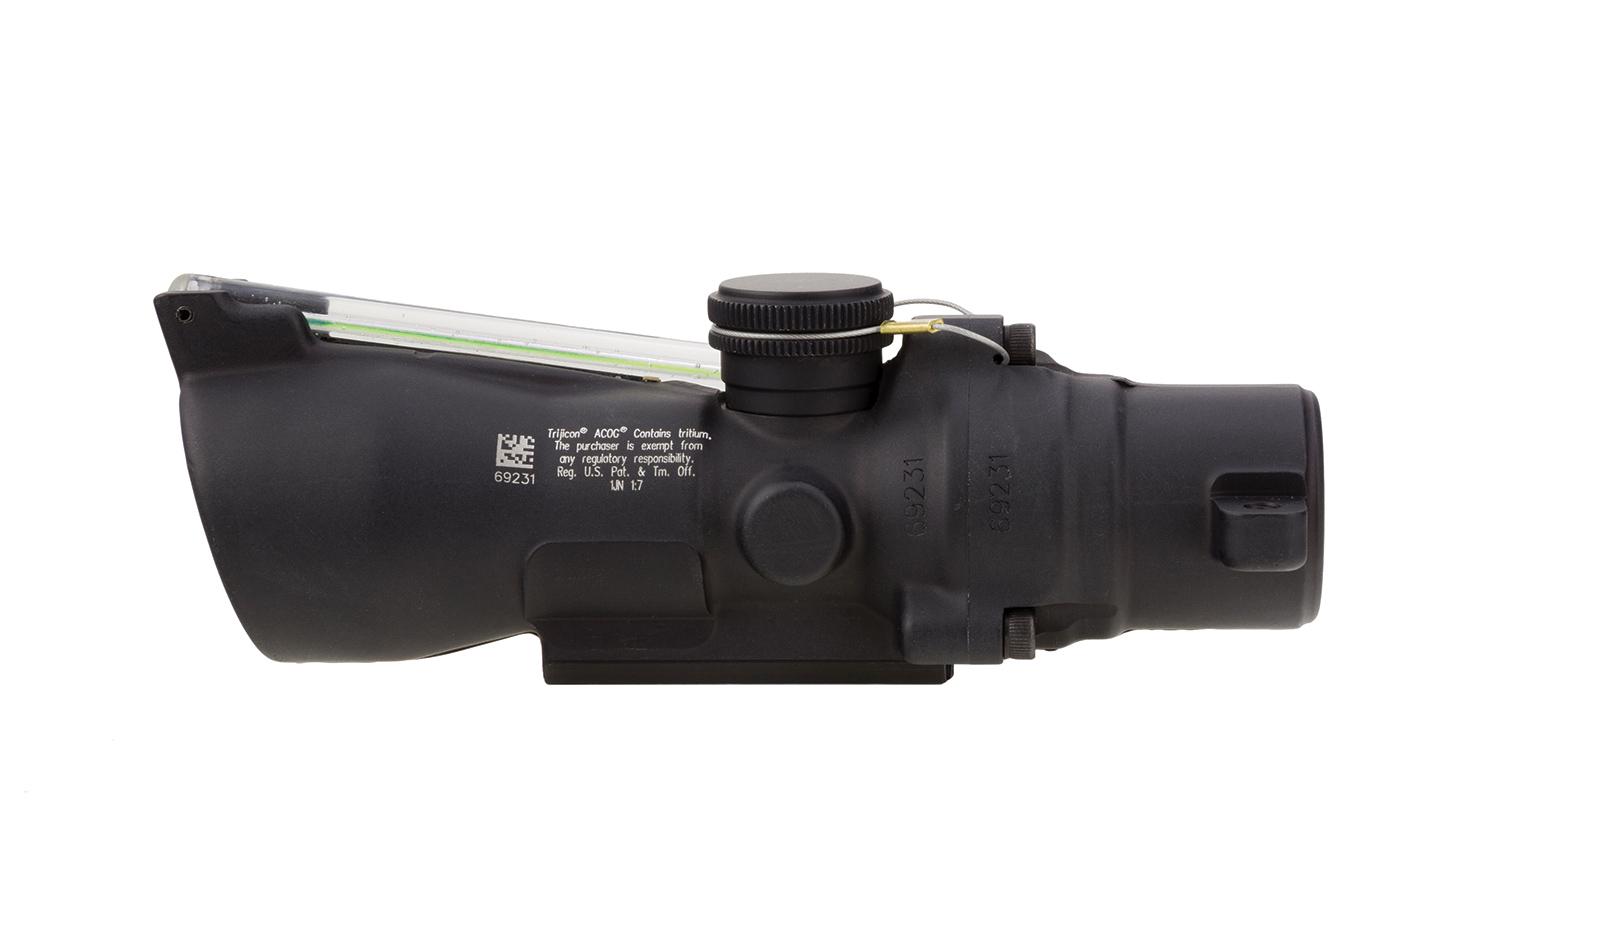 TA50-C-400231 angle 2